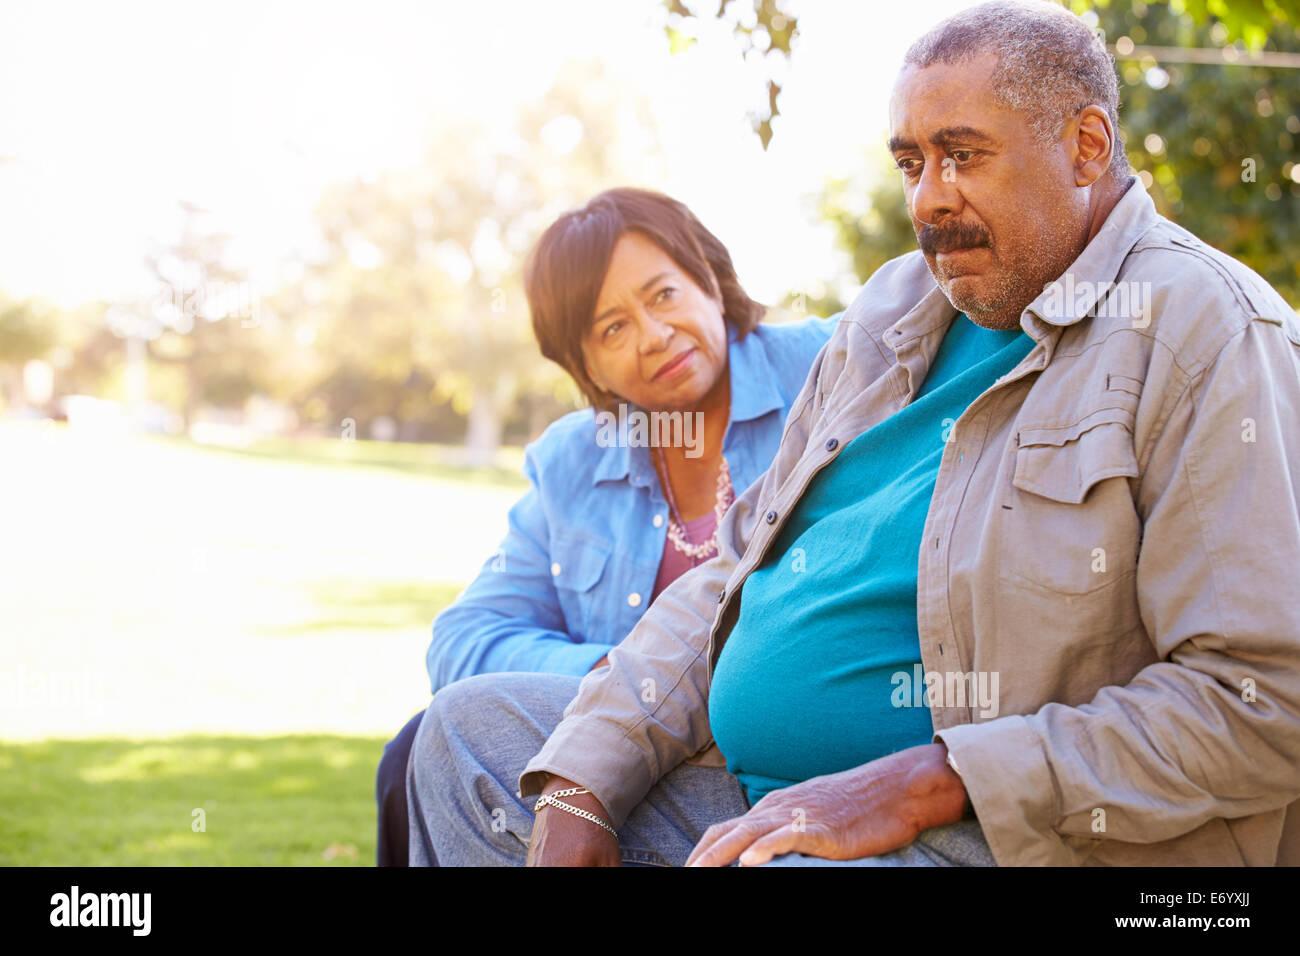 Femme Senior Senior malheureux mari réconfortant en plein air Photo Stock